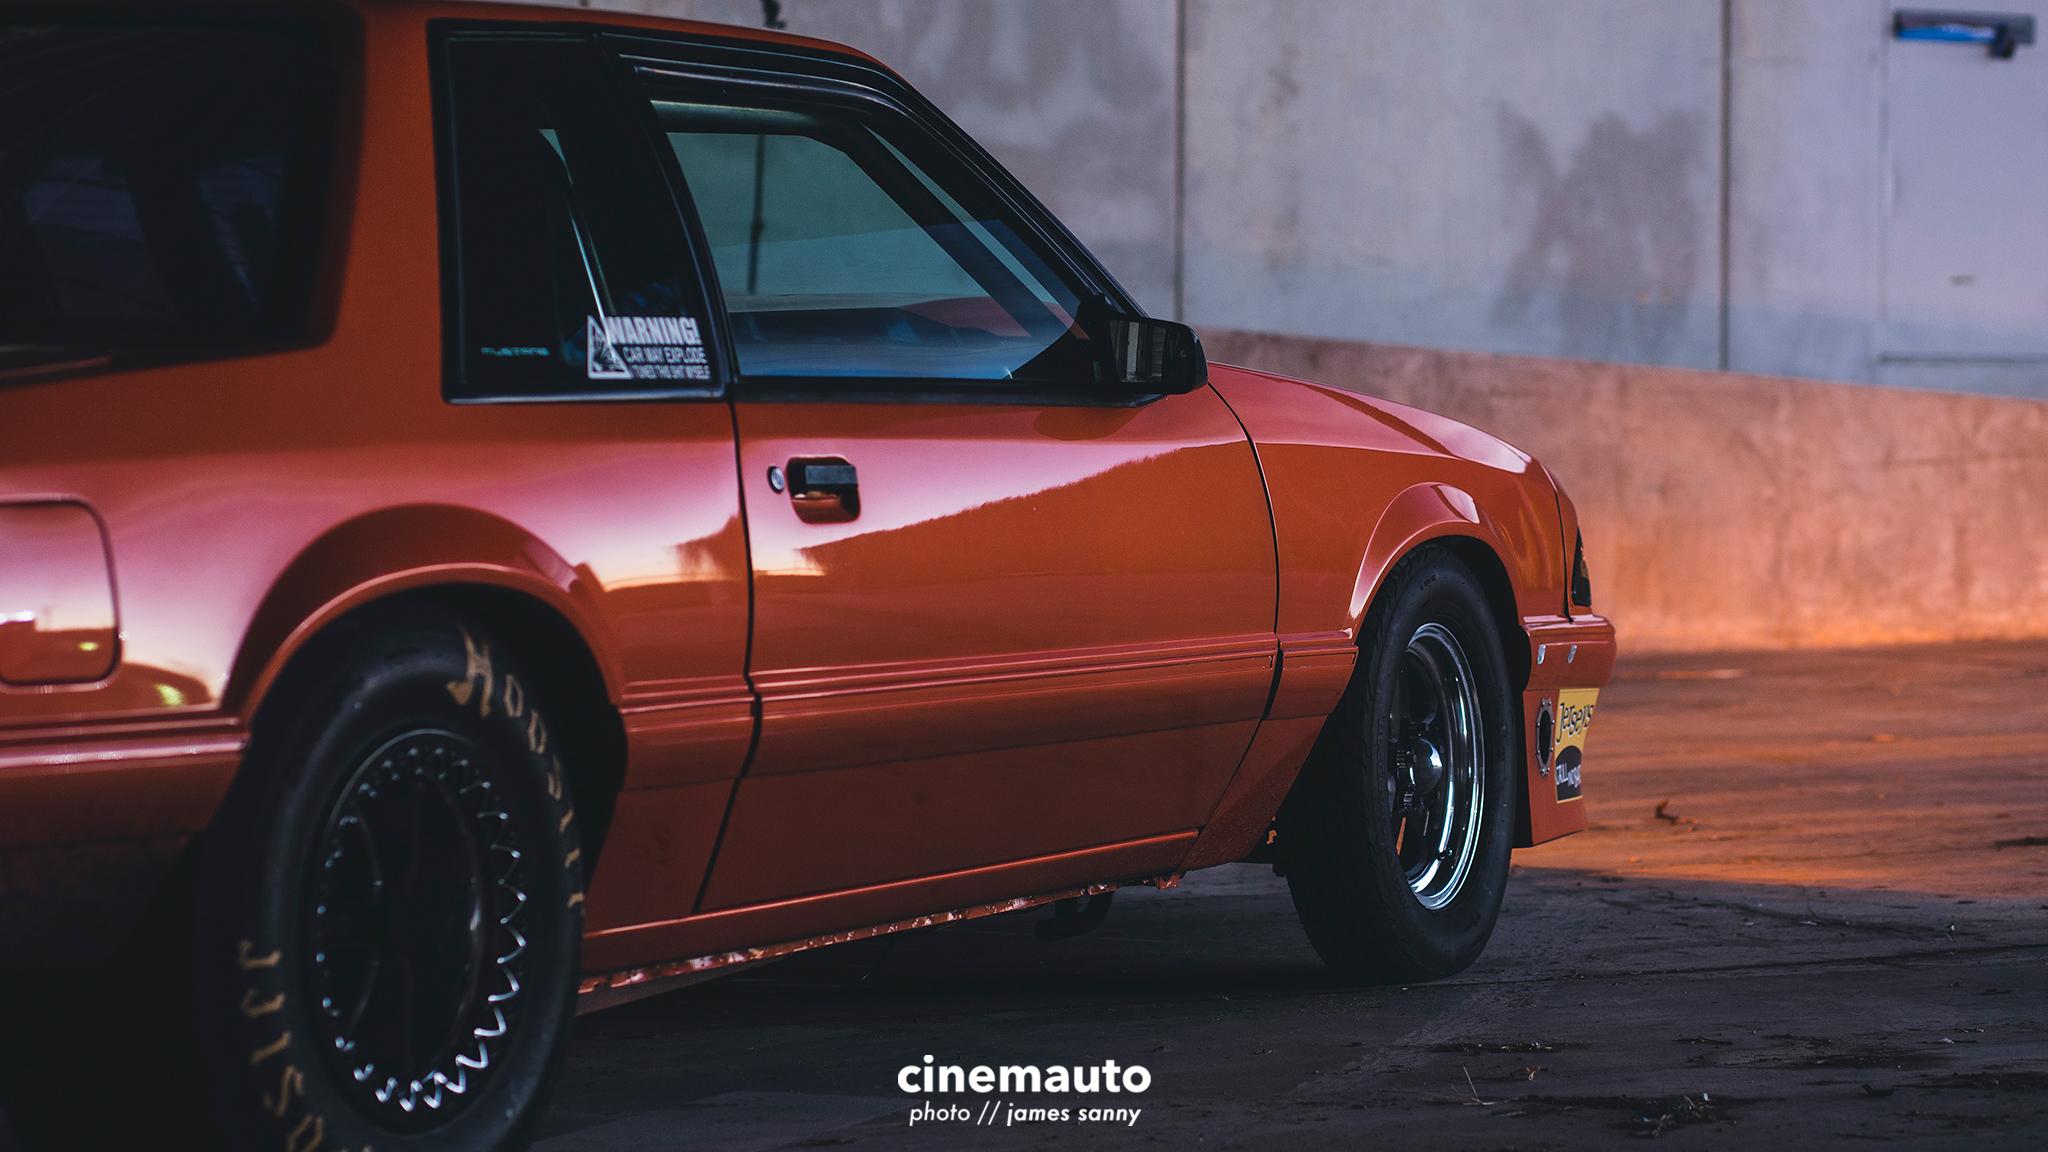 wichita-automotive-photography-kansas-racecar-5.jpg